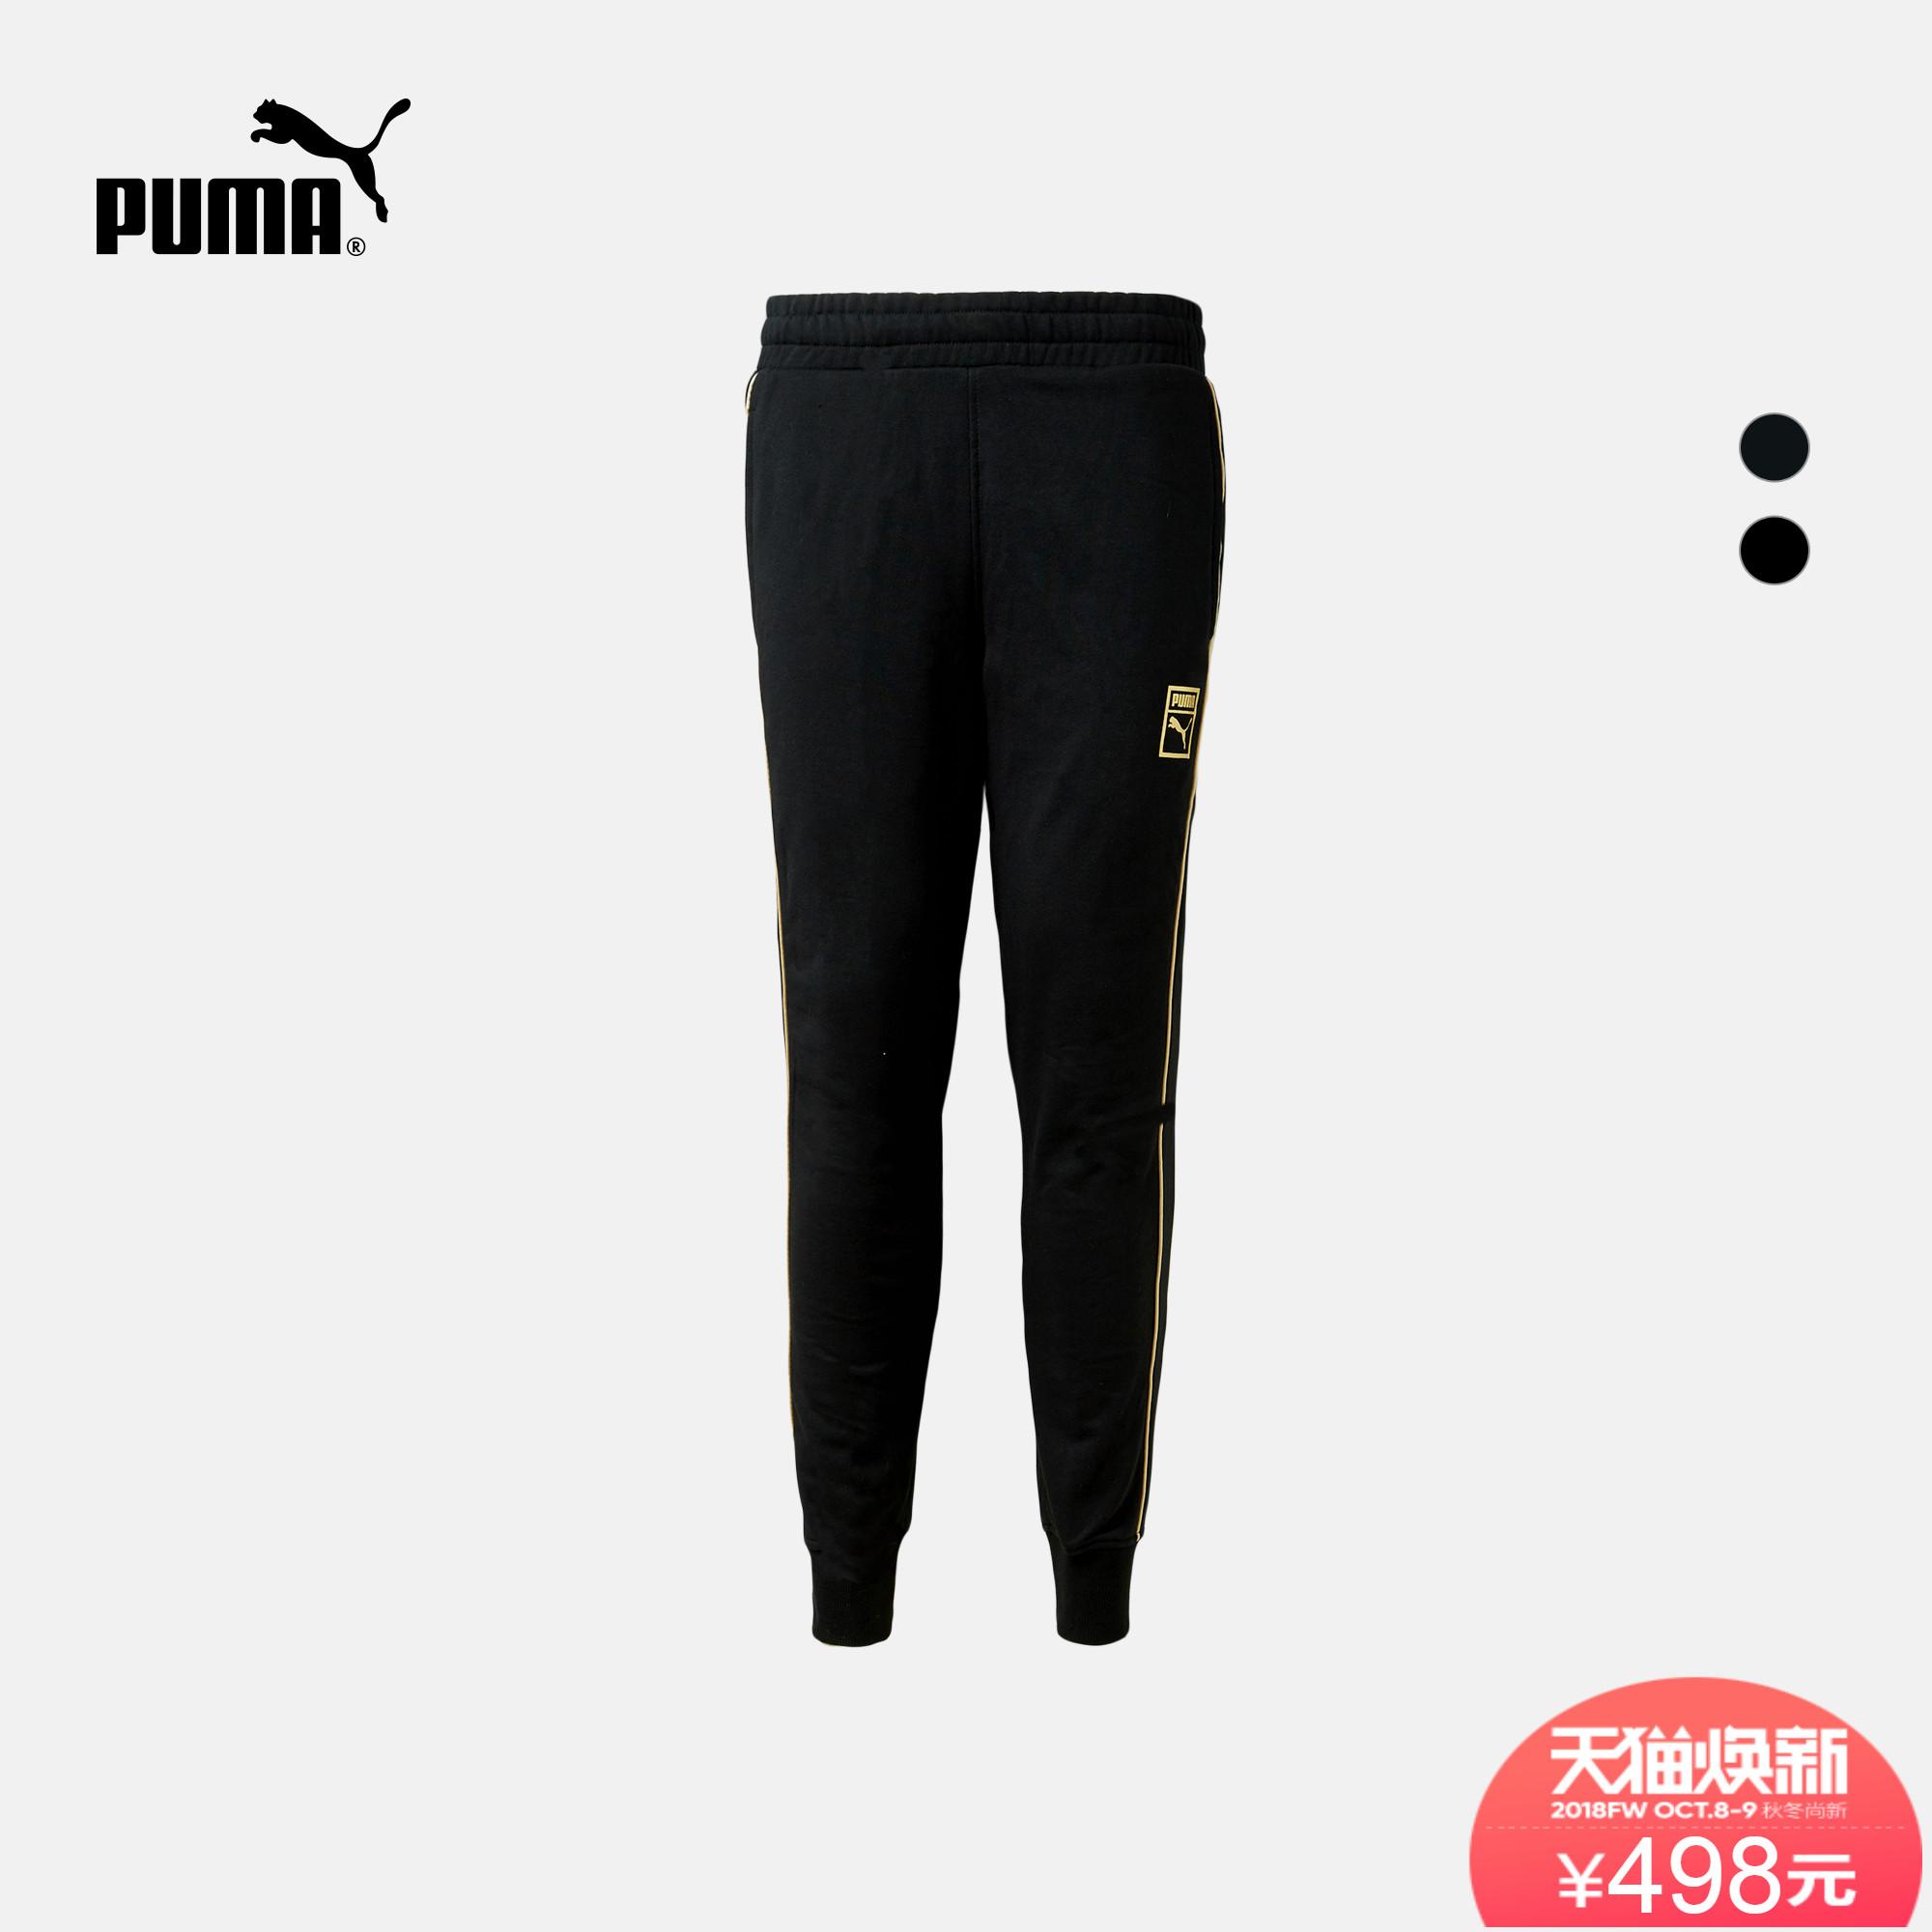 PUMA彪马官方 刘昊然同款 男子抽绳长裤 T7 Metallic 577634